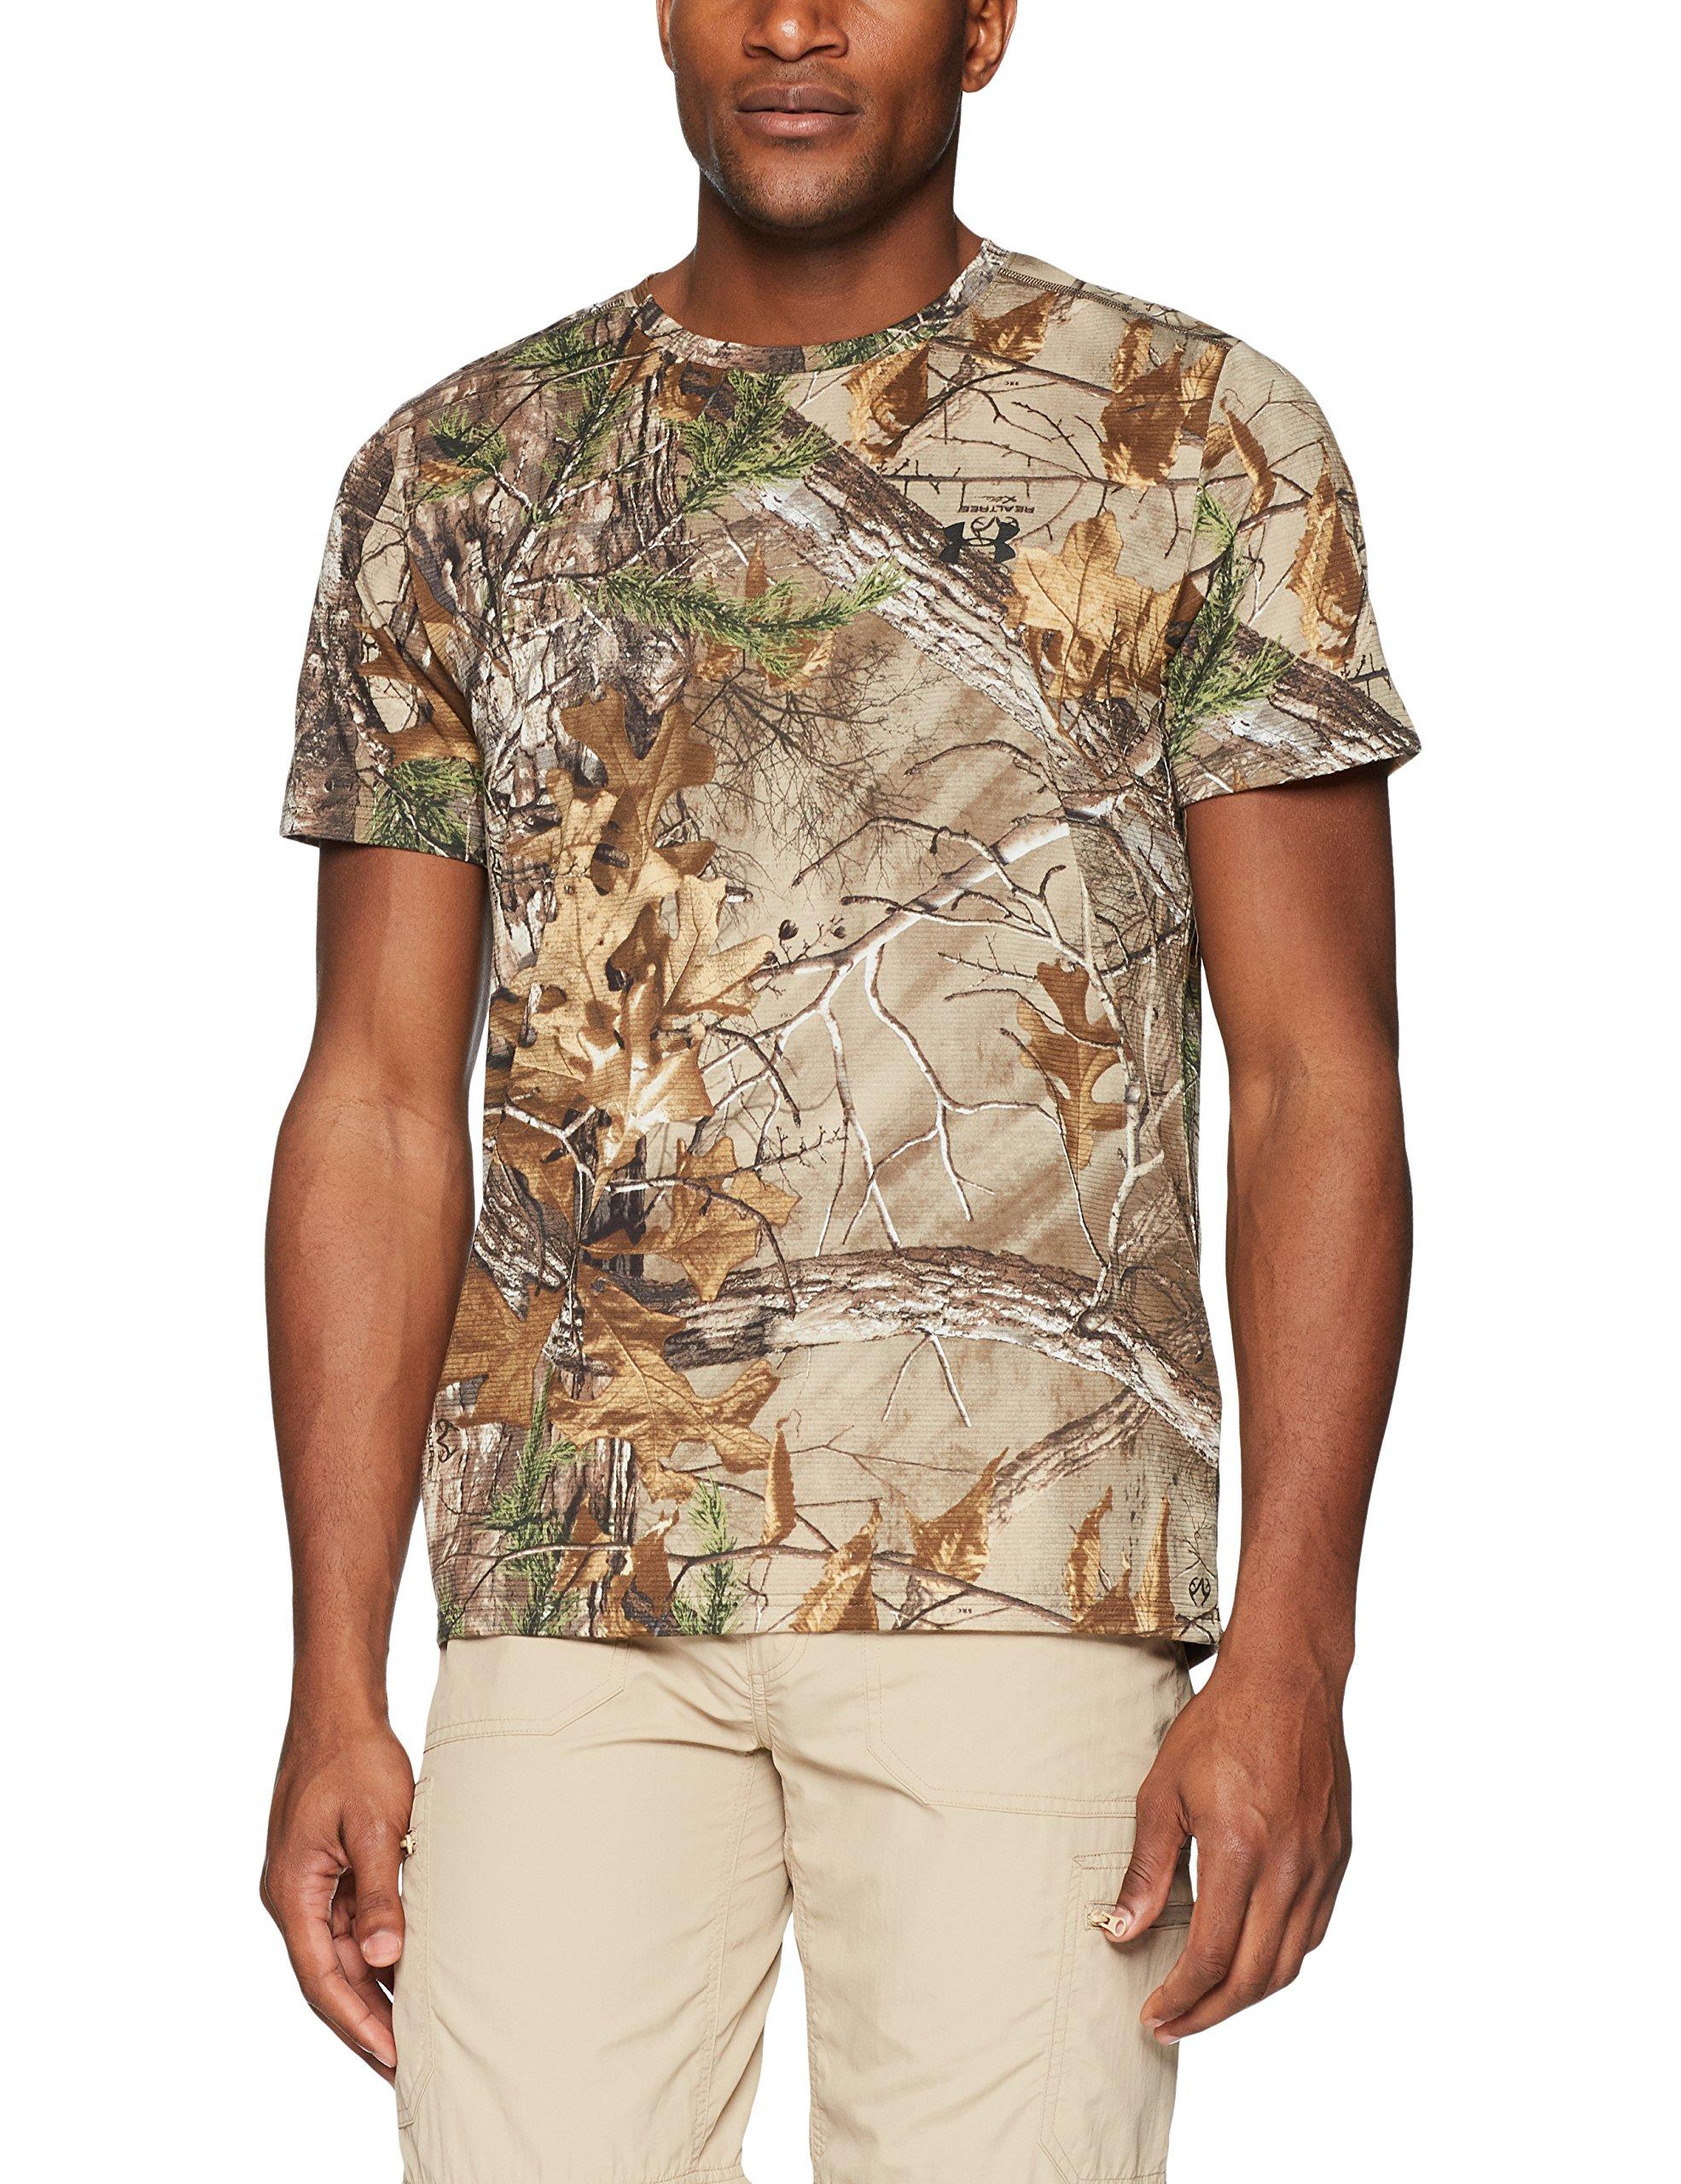 Under Armour Men's Threadborne Camo Shorts Sleeve T-Shirt,Realtree Ap-Xtra /Black, XX-Large by Under Armour